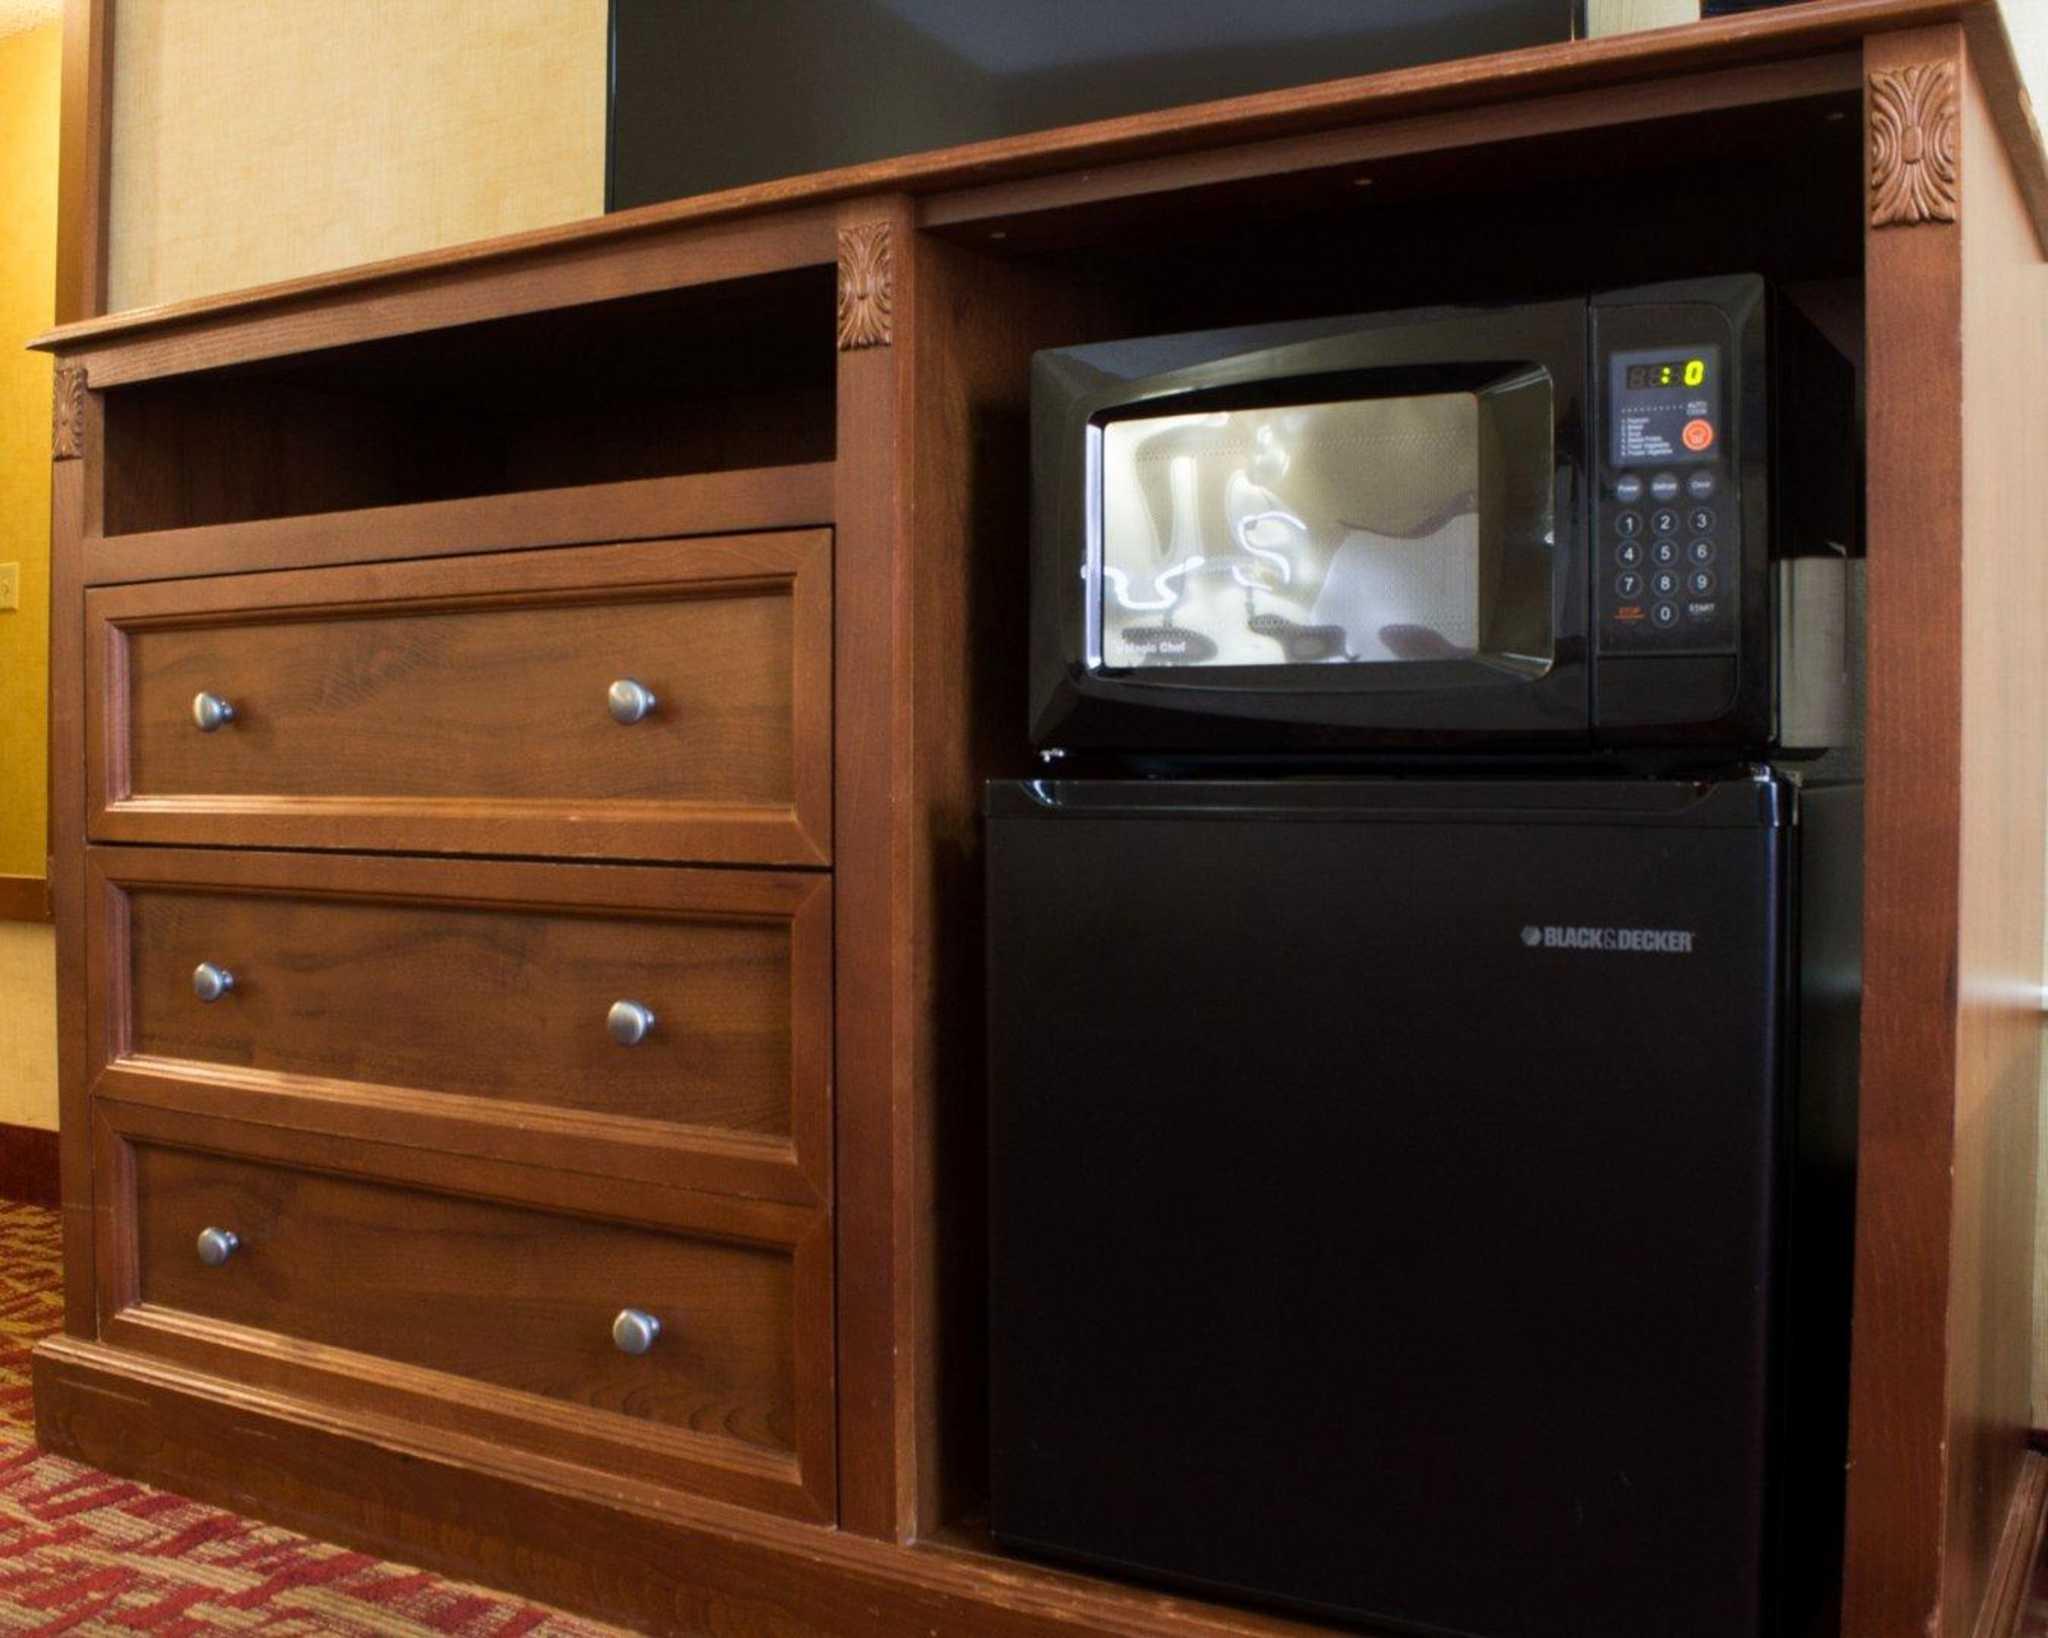 Rodeway Inn image 33